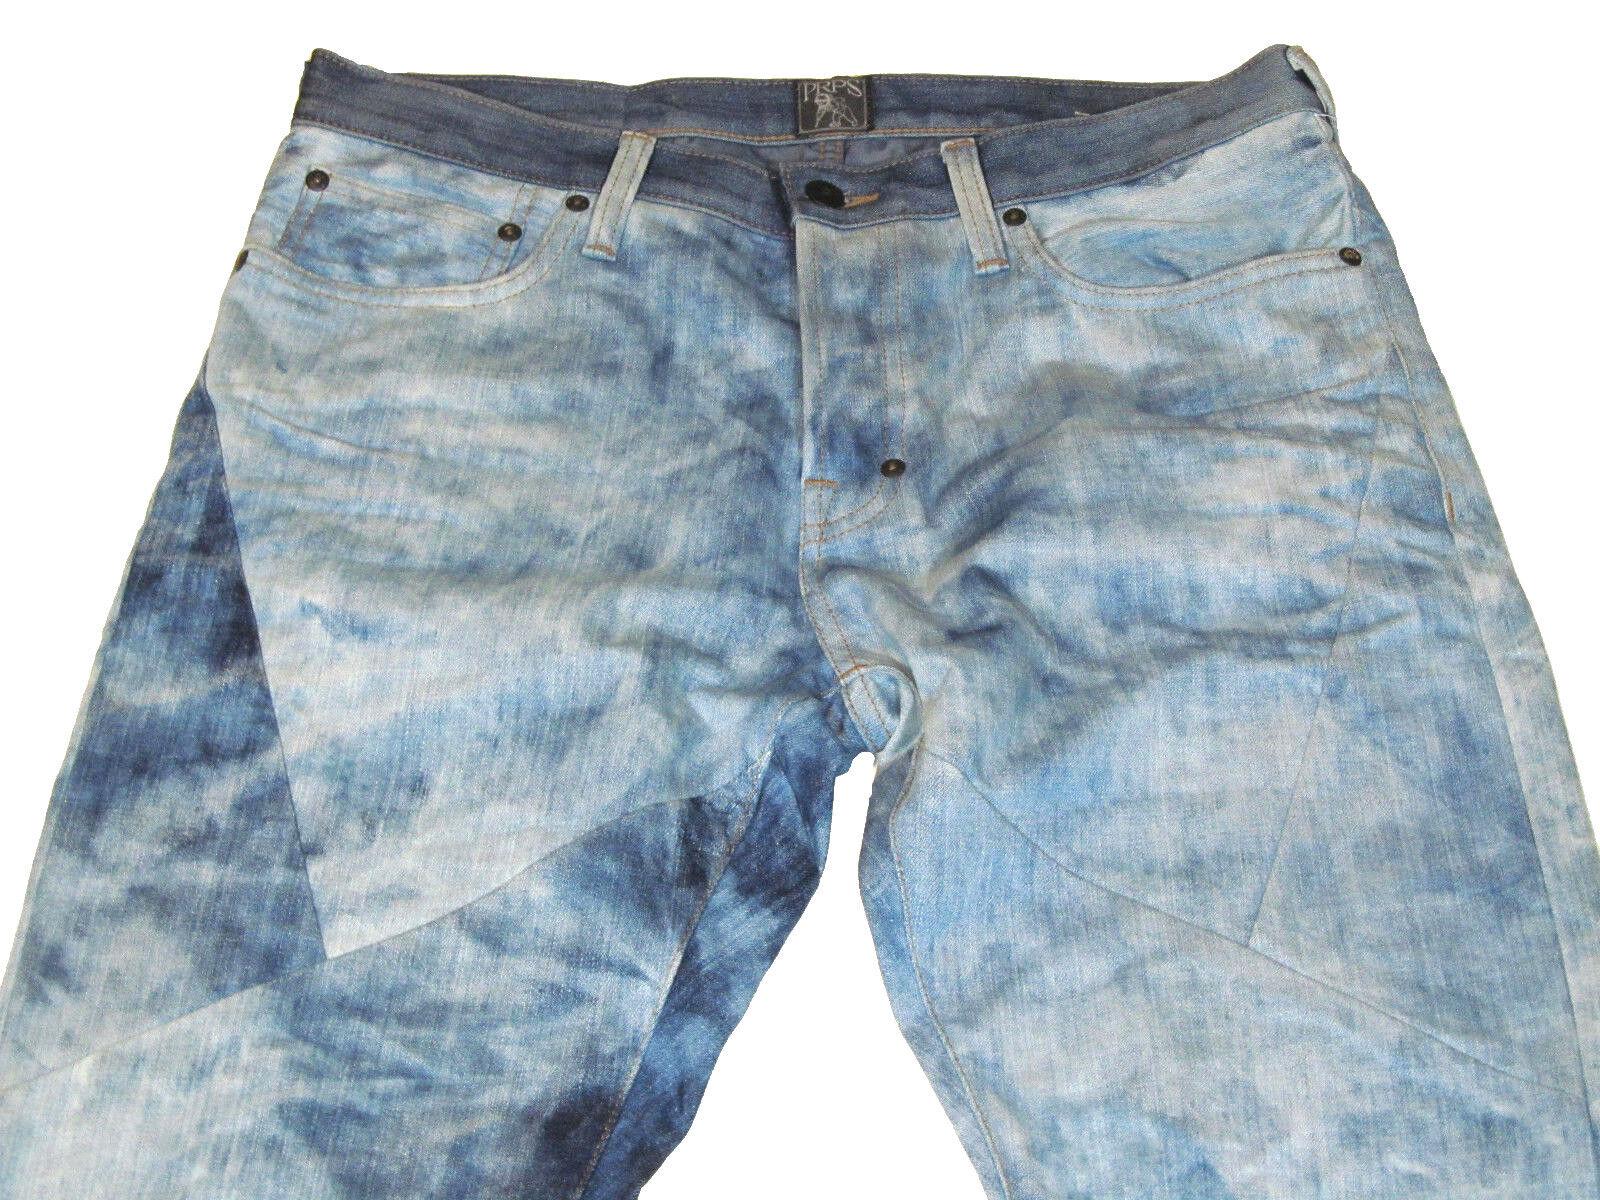 NWT PRPS Goods Mens 32Wx34L Demon Indigo Patched bluee White Jeans E77P112P